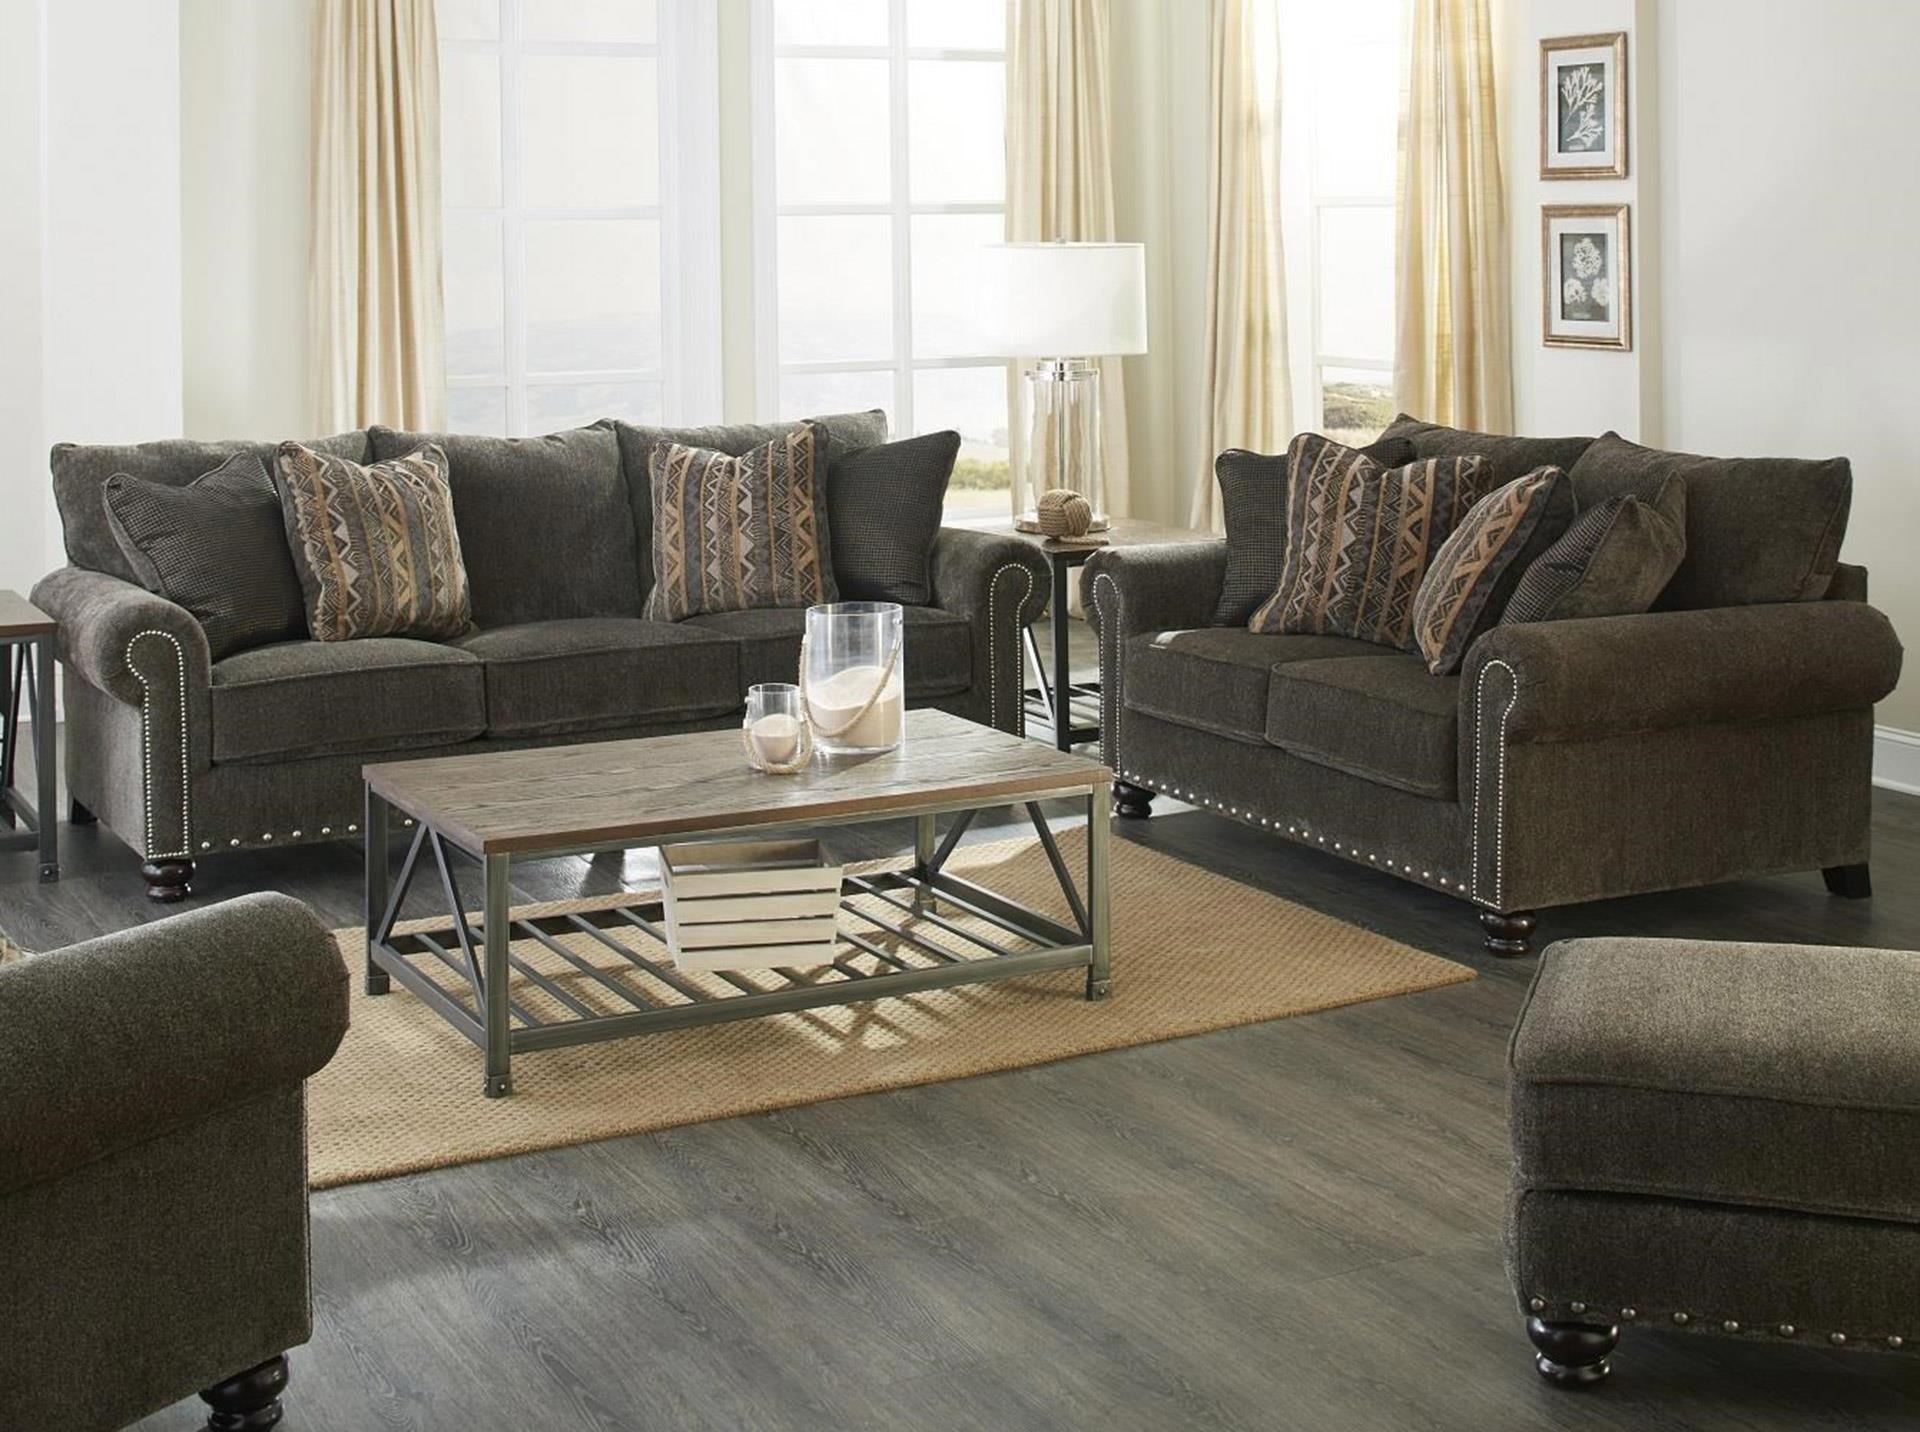 Jackson Furniture Avery Sofa & Loveseat - Item Number: GRP-3261-SL